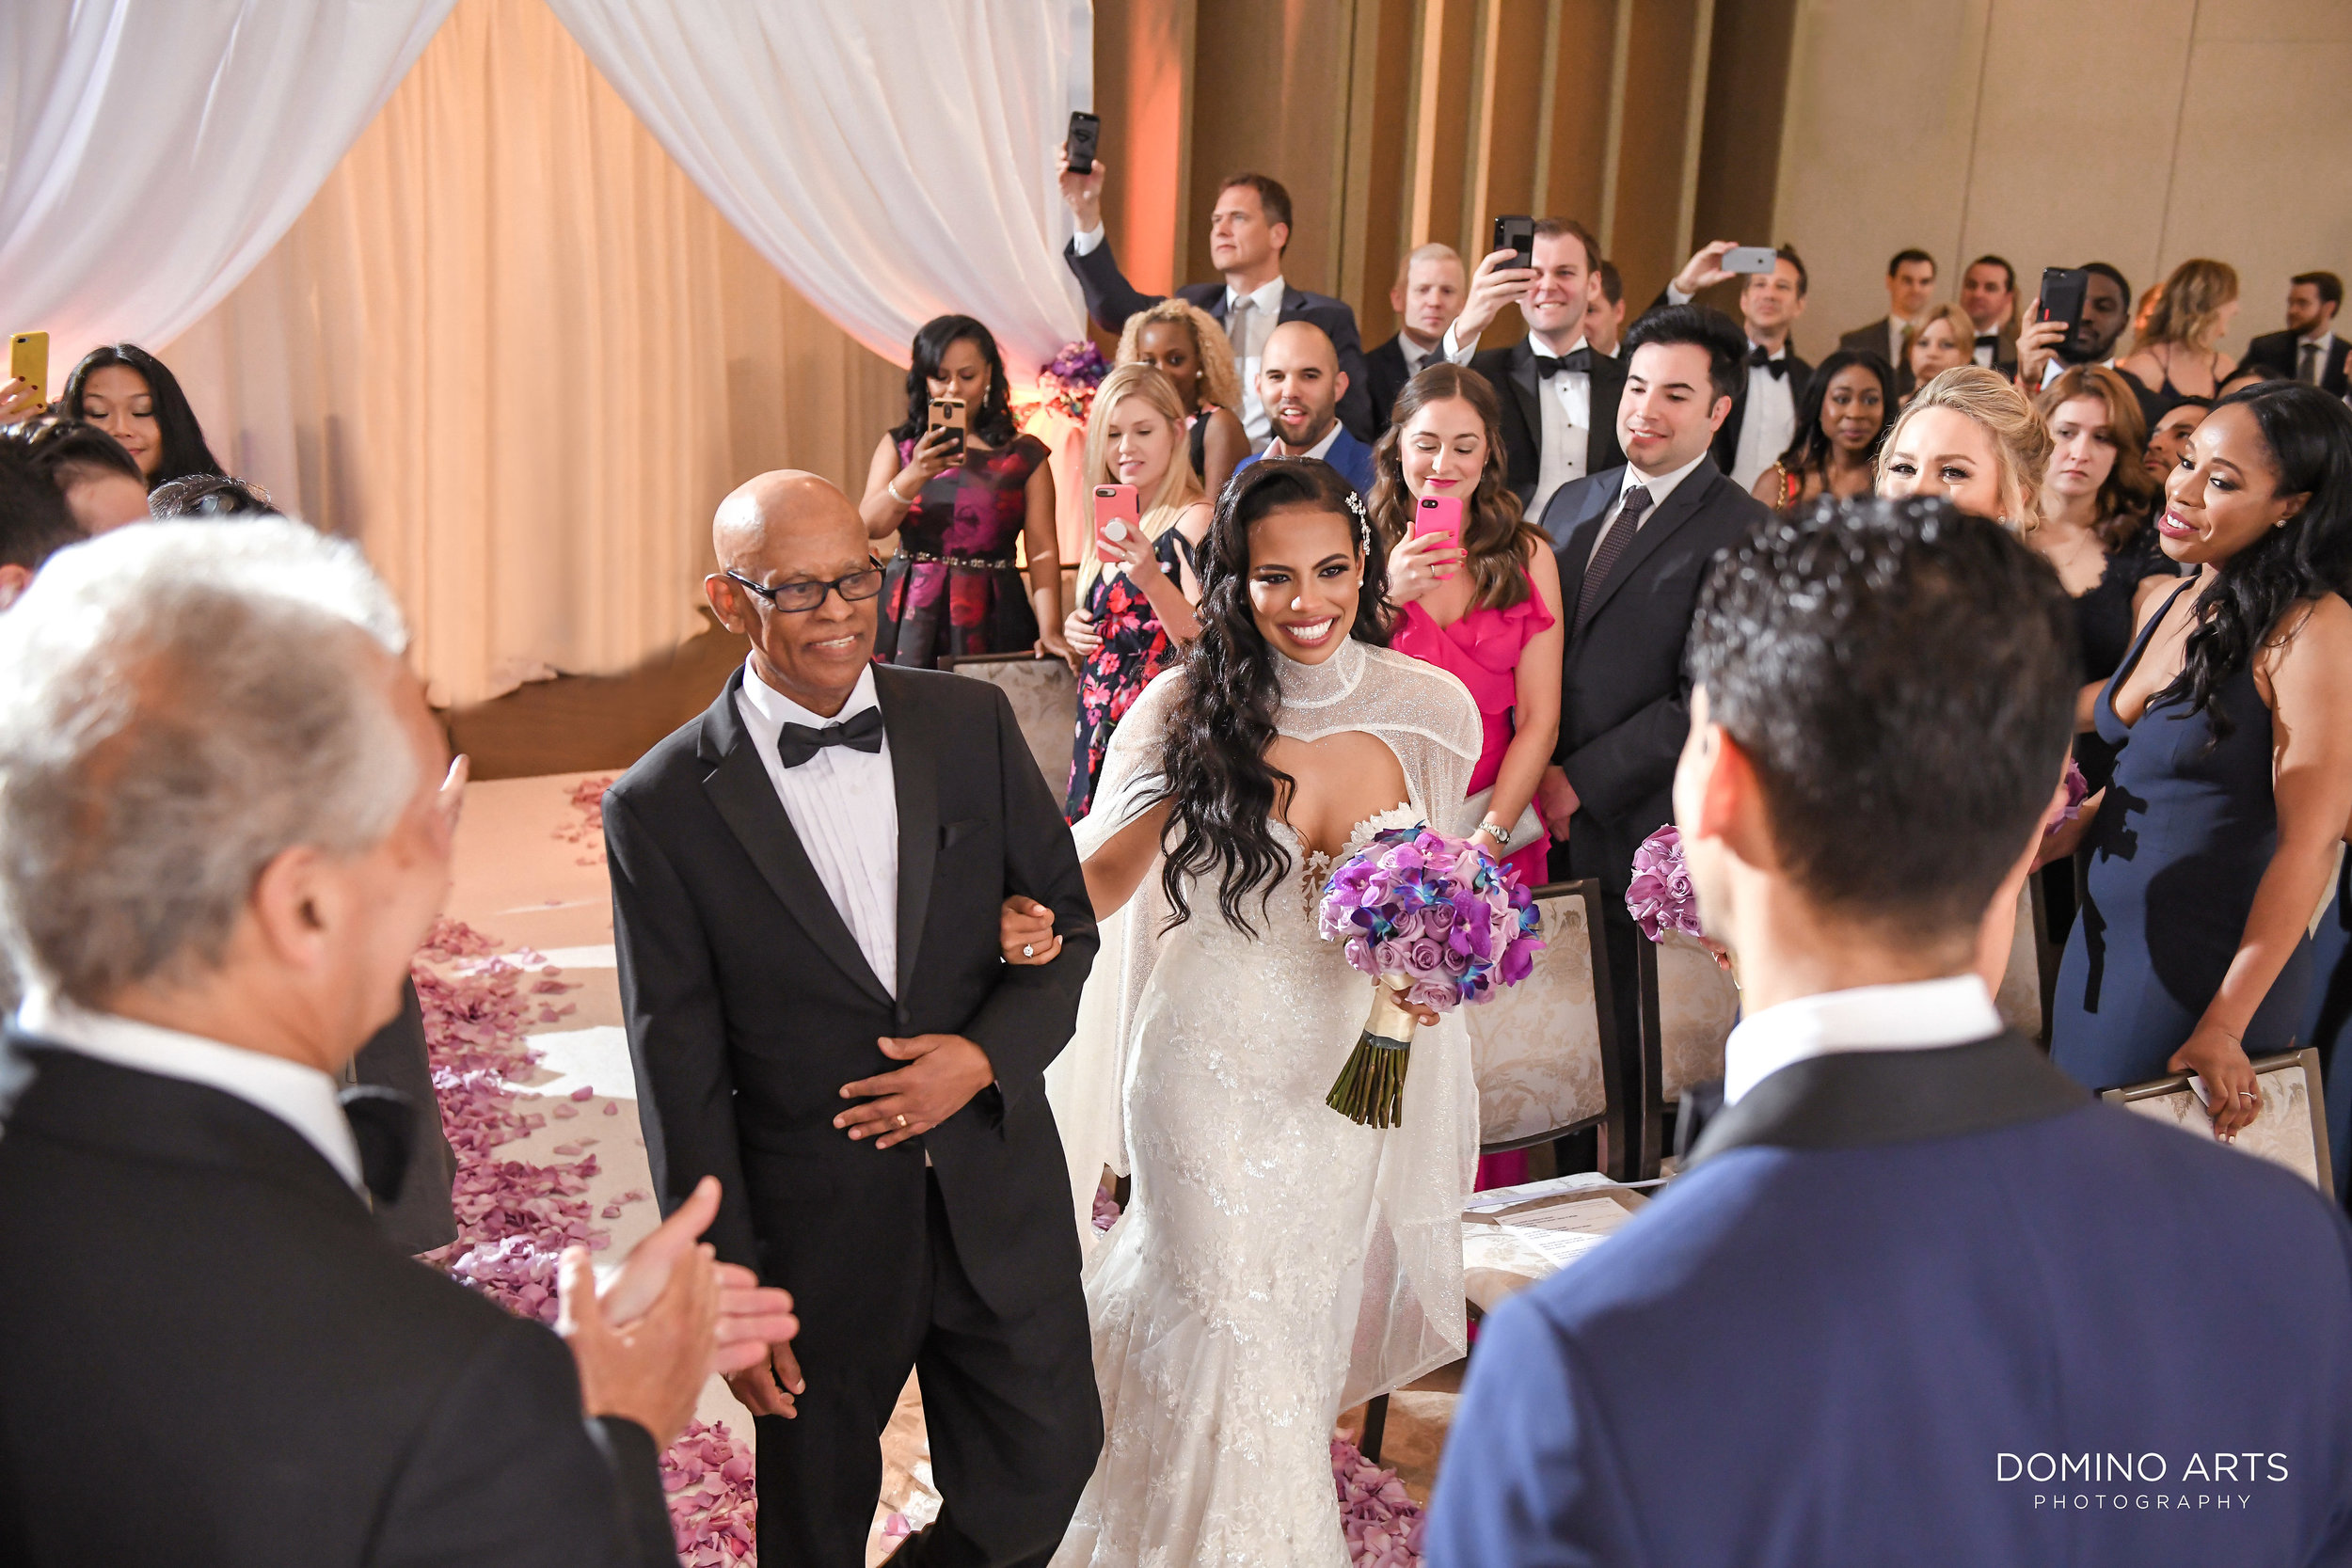 Wedding-Pictures-Photography-St.RegisBalHarbour0254-Edit.jpg